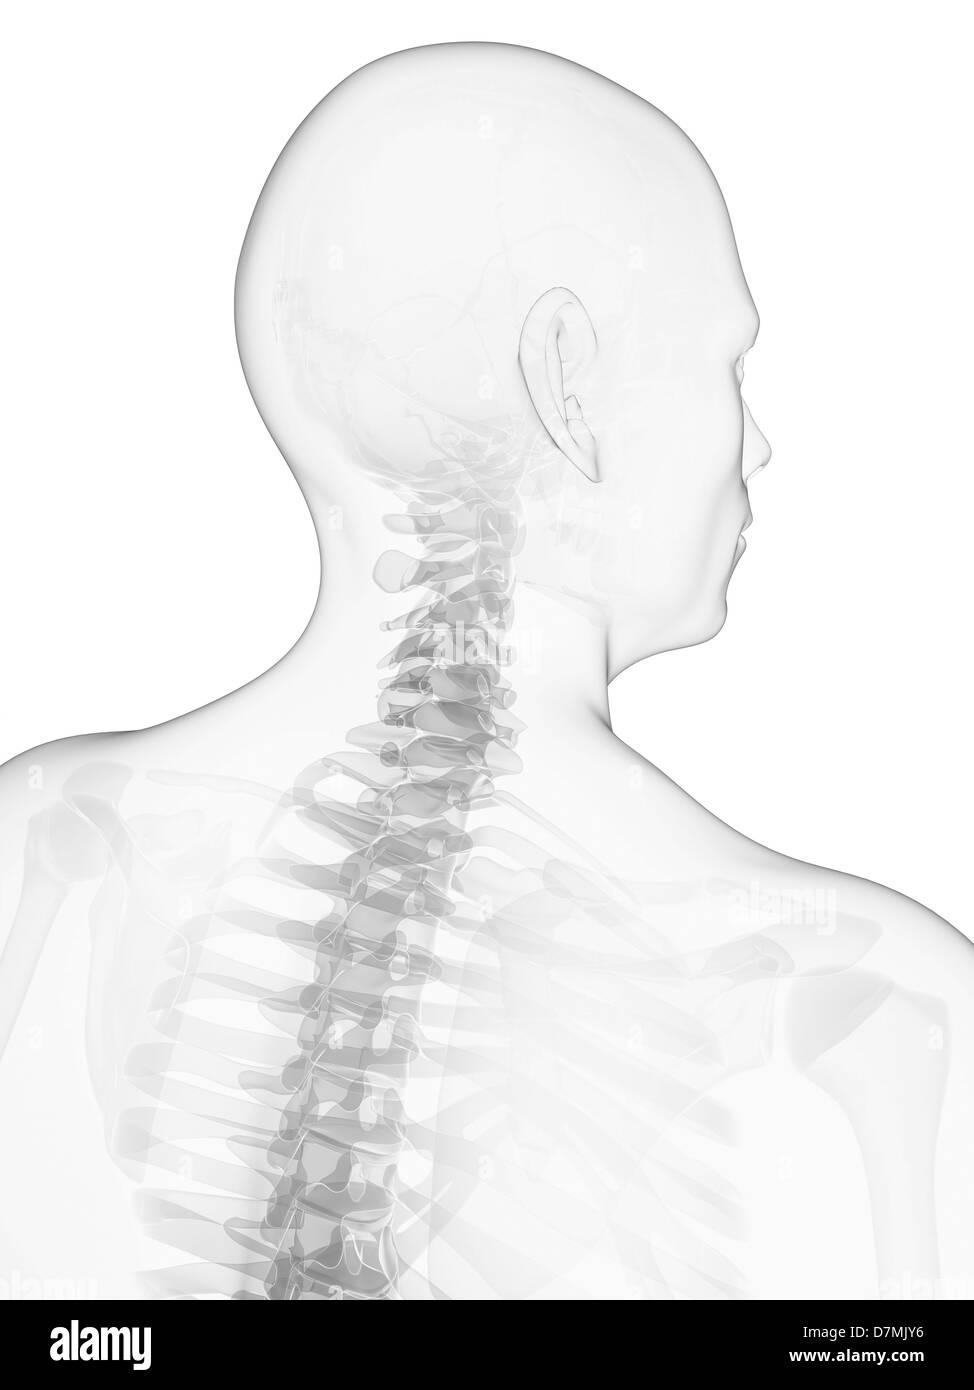 hight resolution of neck bones artwork stock image